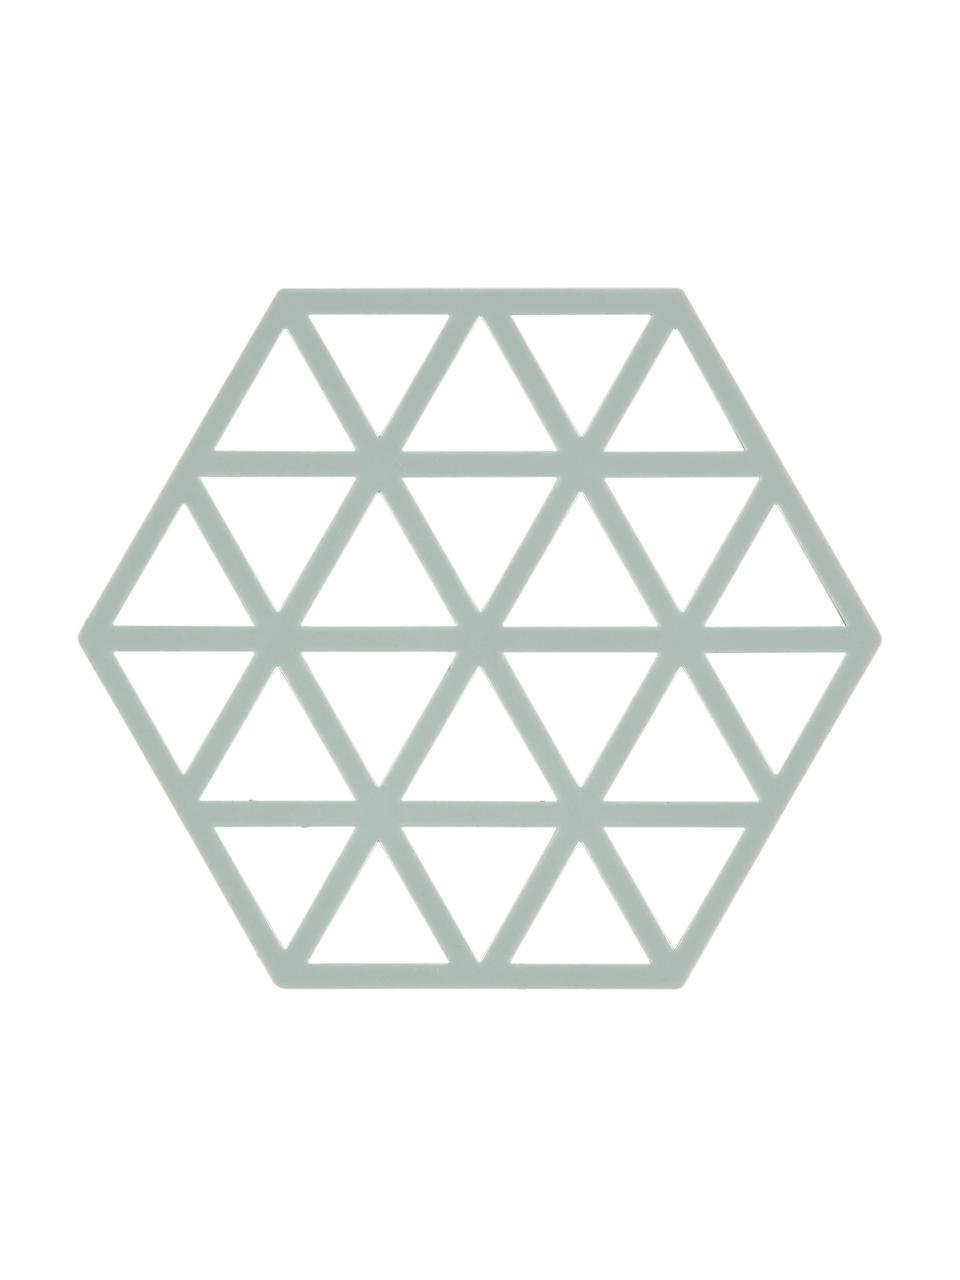 Silikon Topfuntersetzer Triangle in Pastellblau, 2 Stück, Silikon, Pastellblau, B 14 x T 16 cm